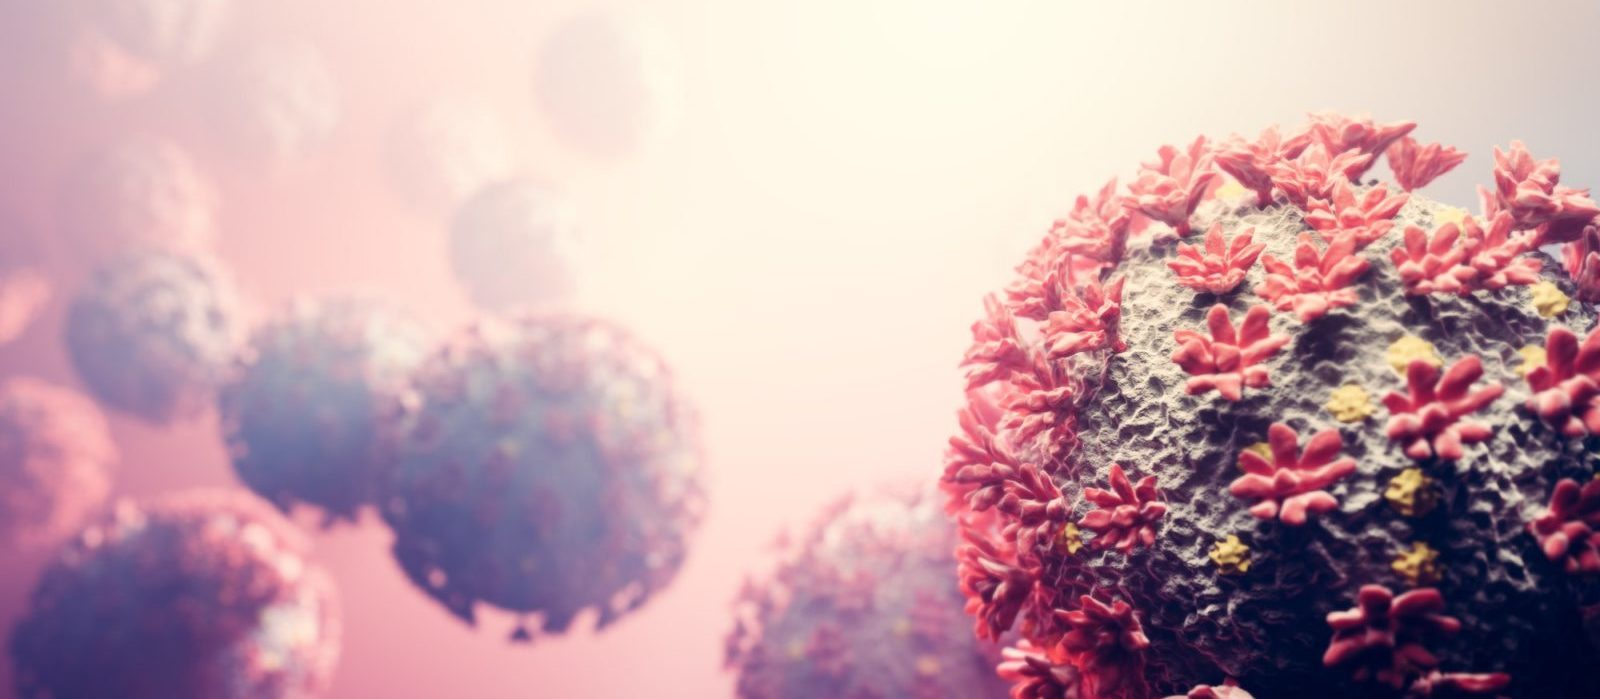 Symbolbild Corona-Virus COVID-19